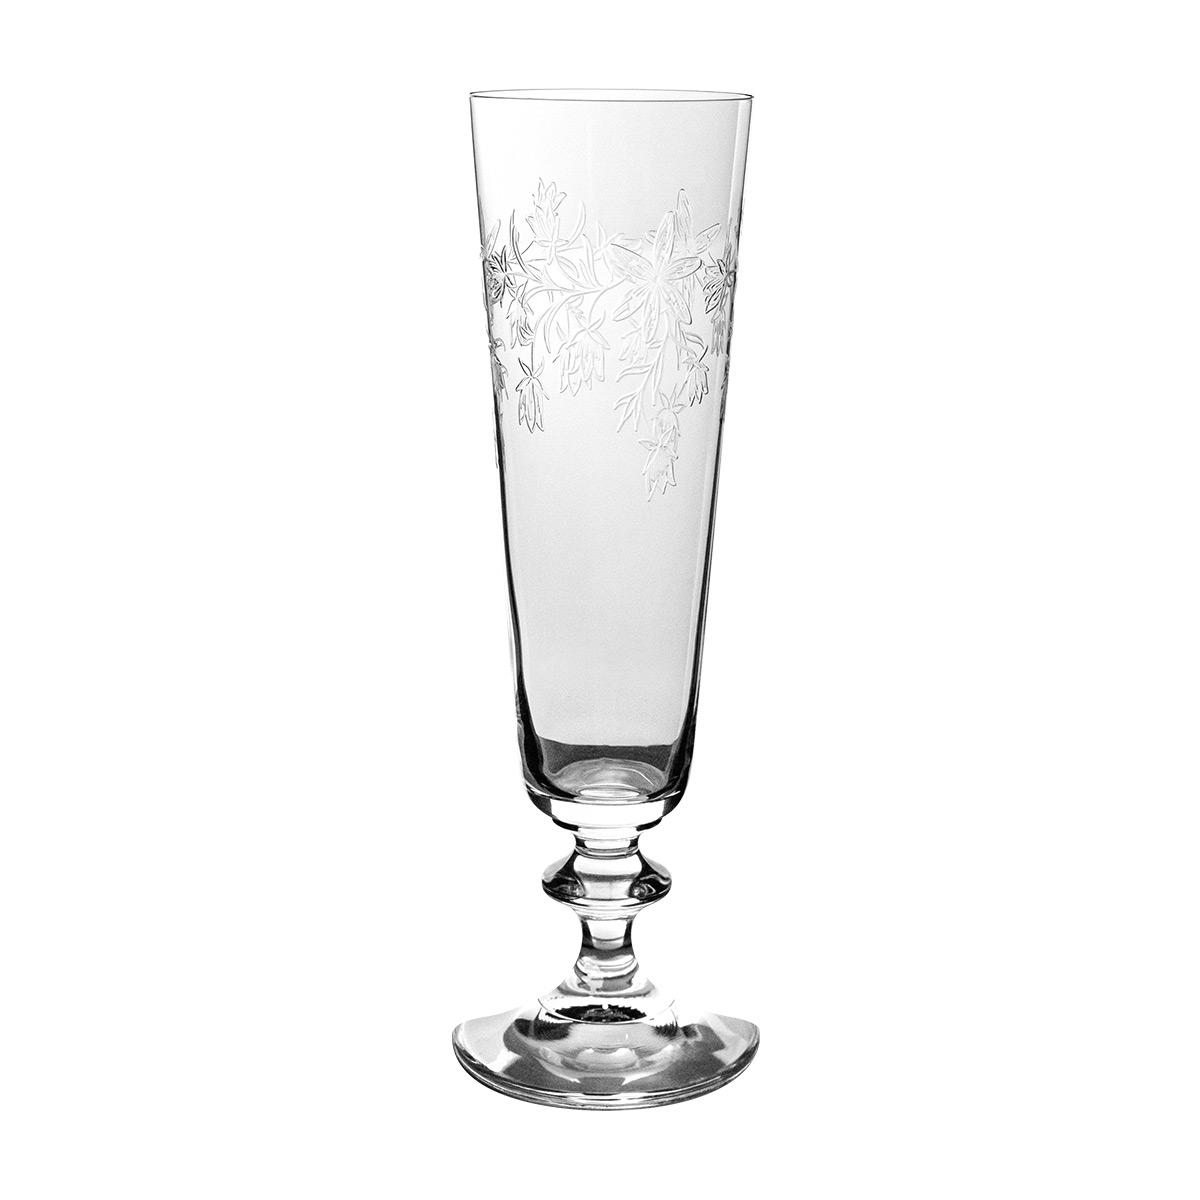 BOHEMIA Cristal _ ヴァレンティナ / シャンペンフルート